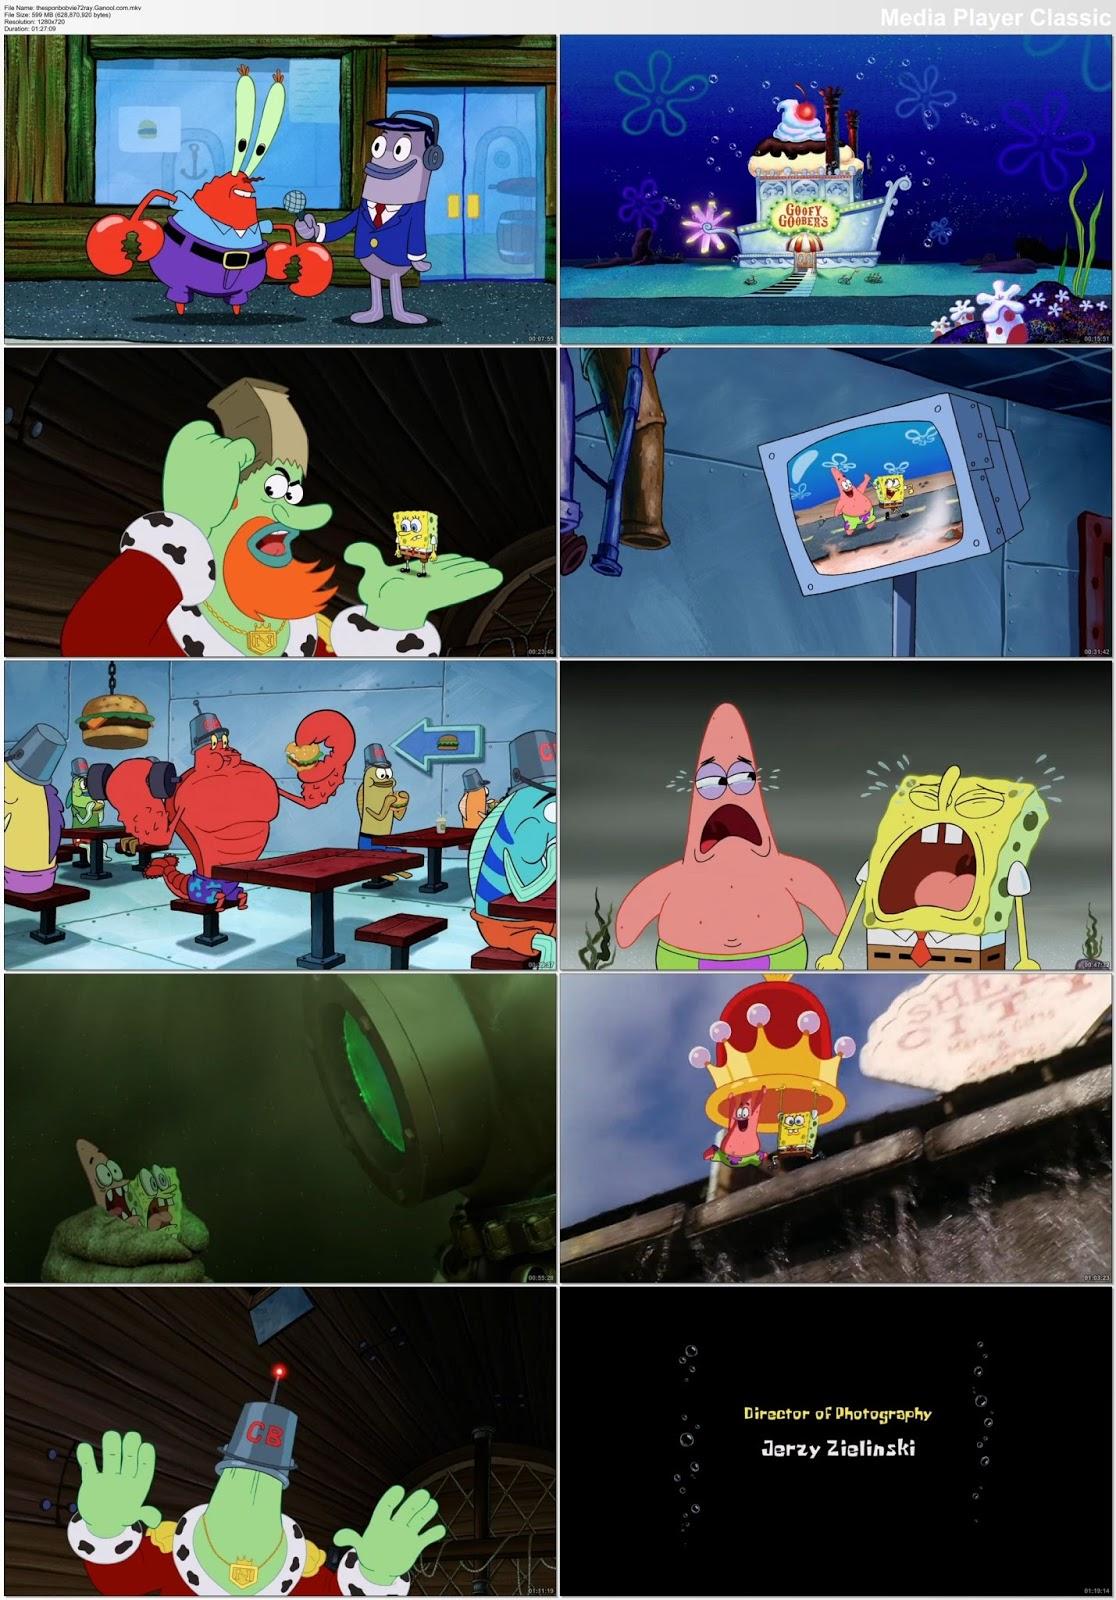 download the spongebob squarepants movie 2004 bluray 720p